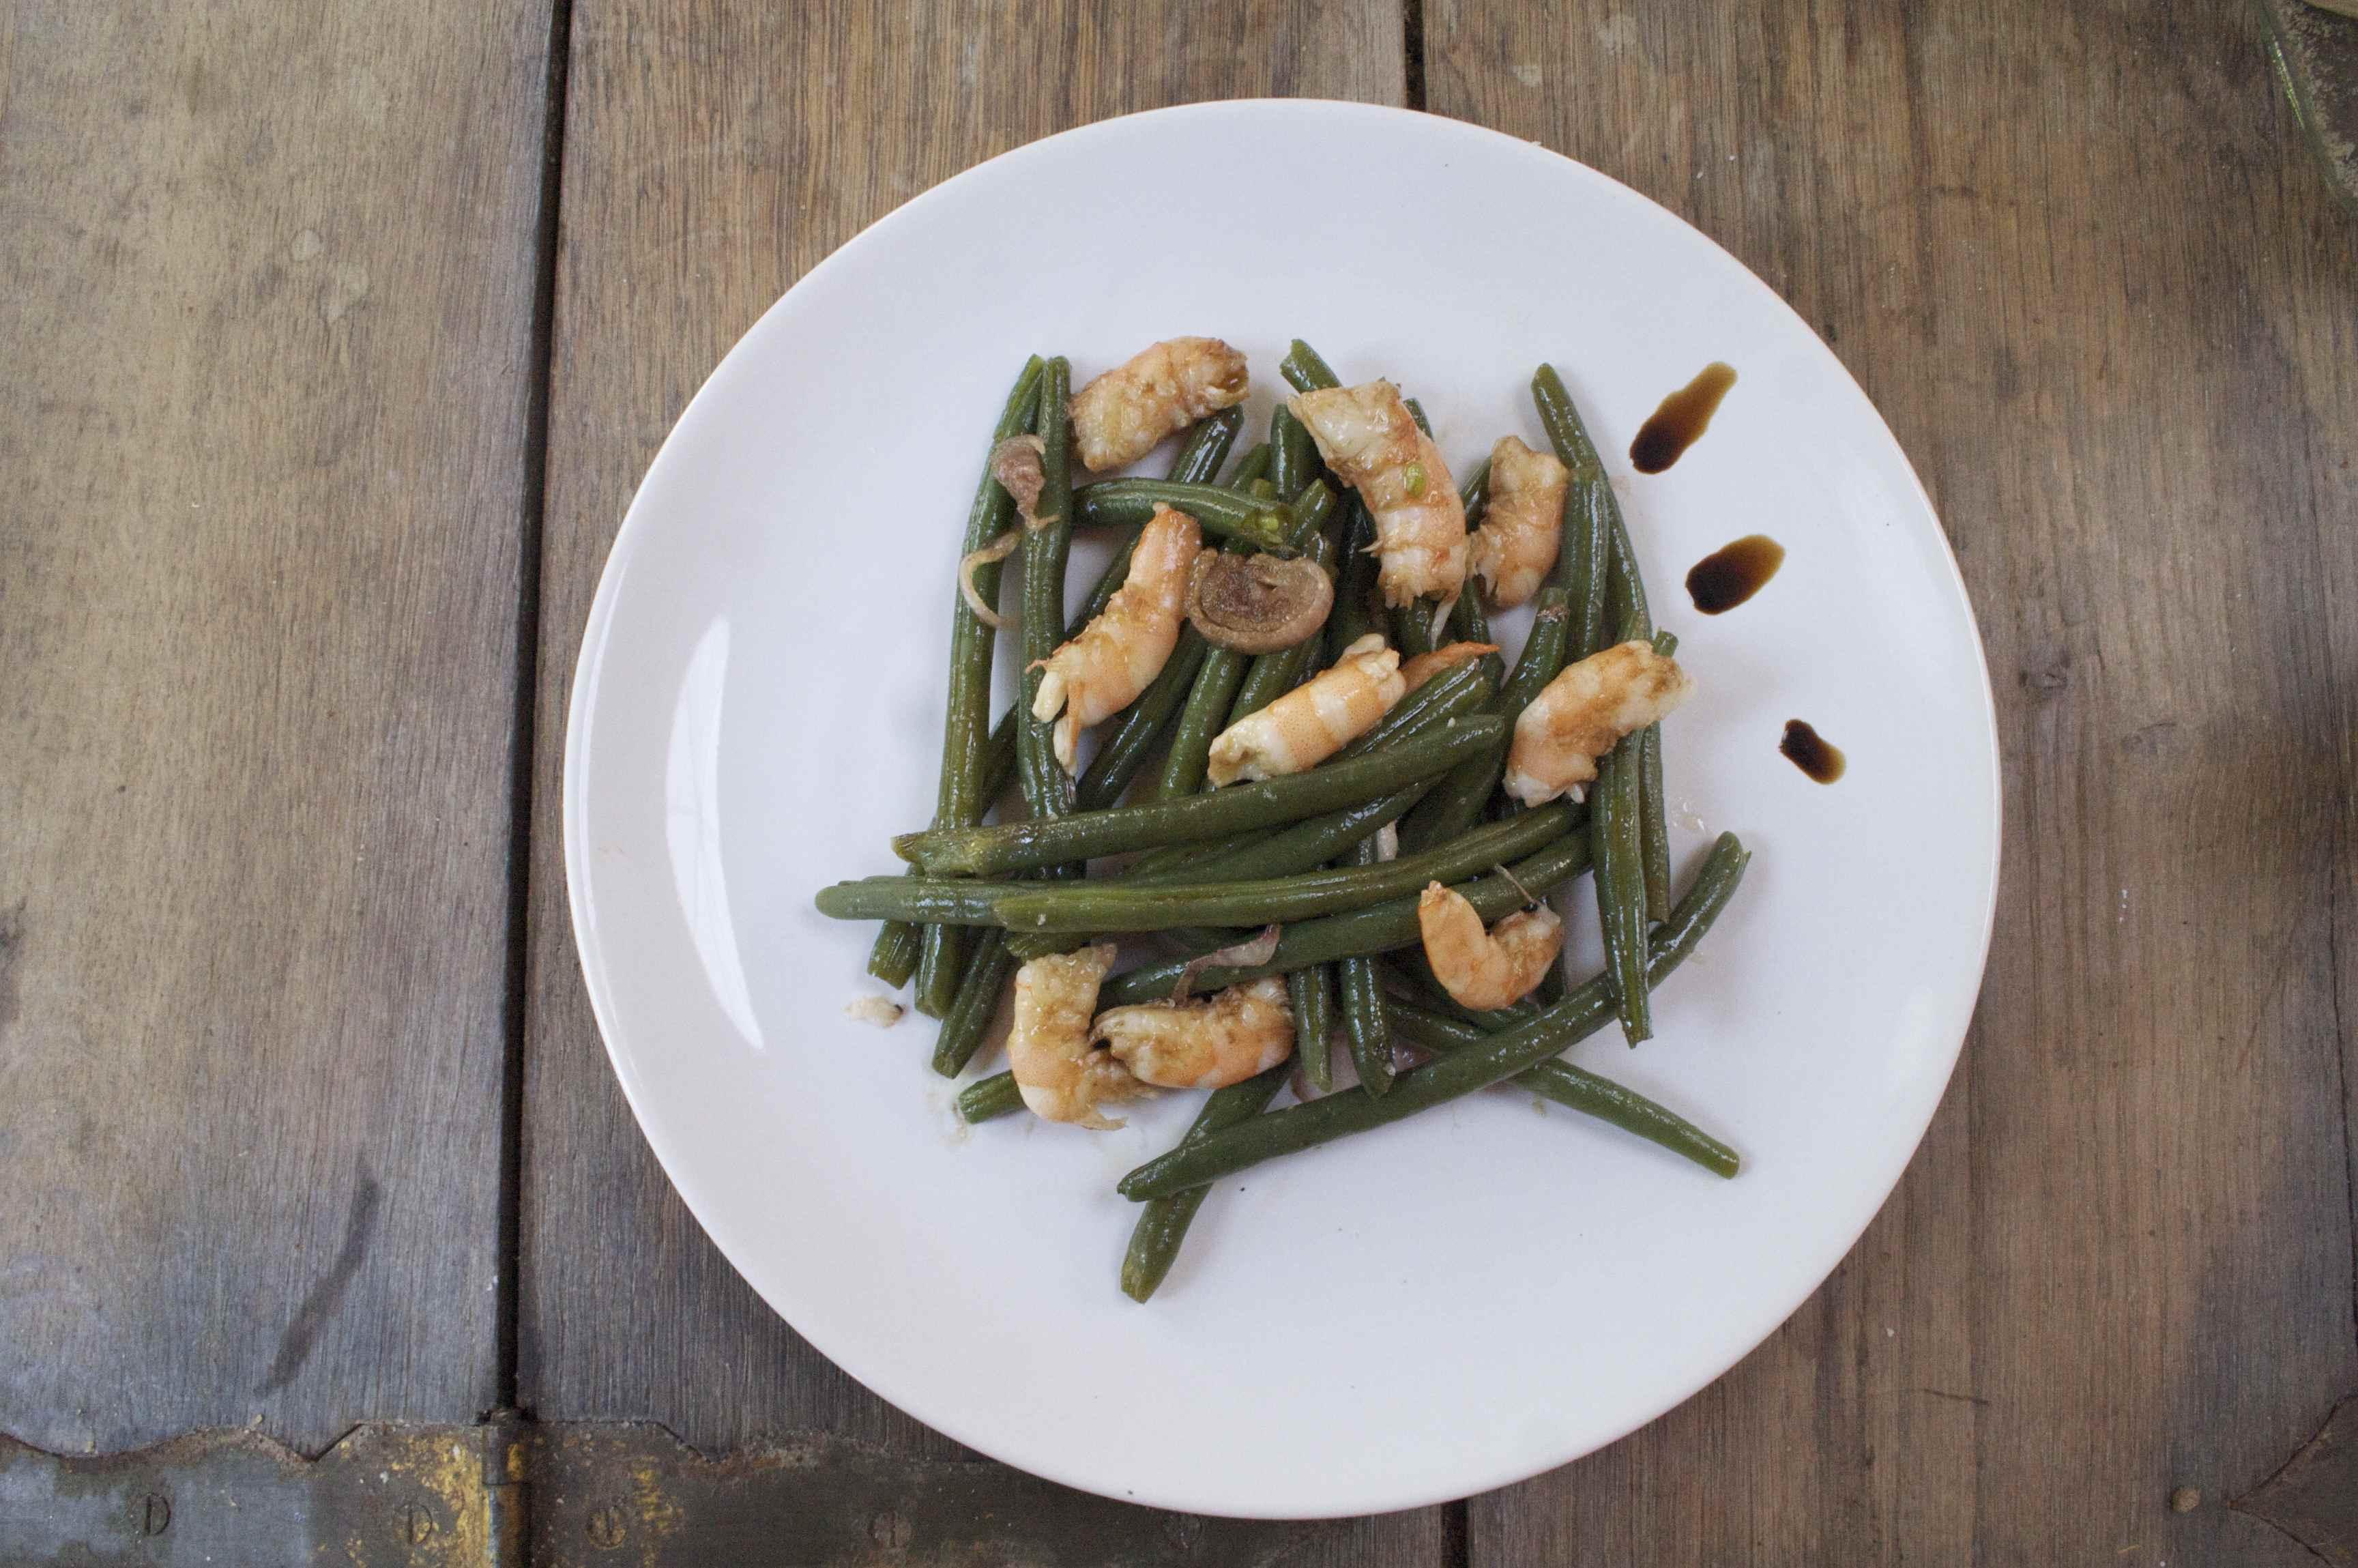 Salade de langoustines & haricots verts + sauce balsamic.jpg